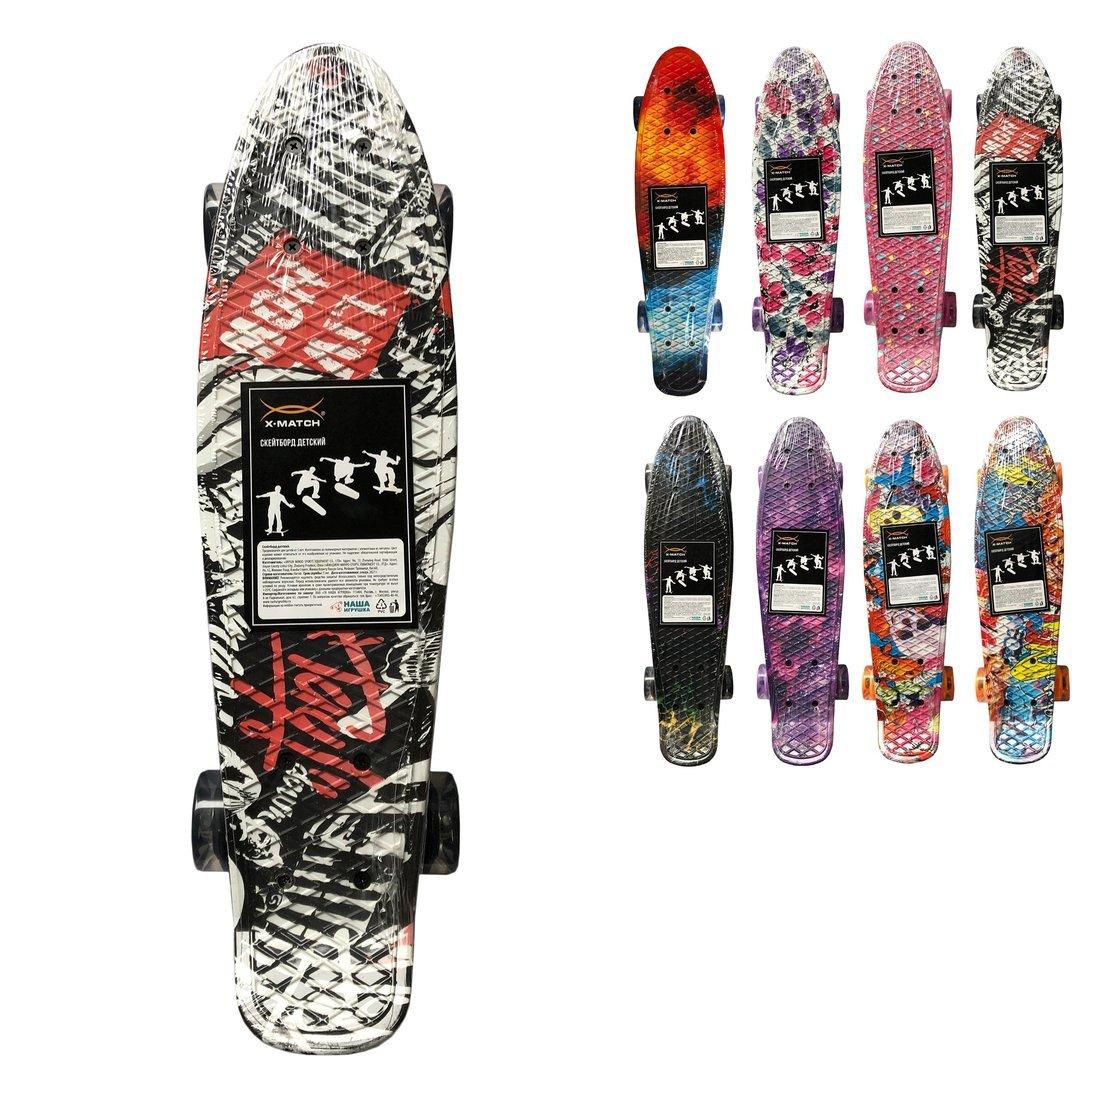 X-Match 636276 Скейтборд пласт. 56. 5х14. 5см, PU колеса со светом, 4 цвета микс, c алюмин. креплениями, ассорт.